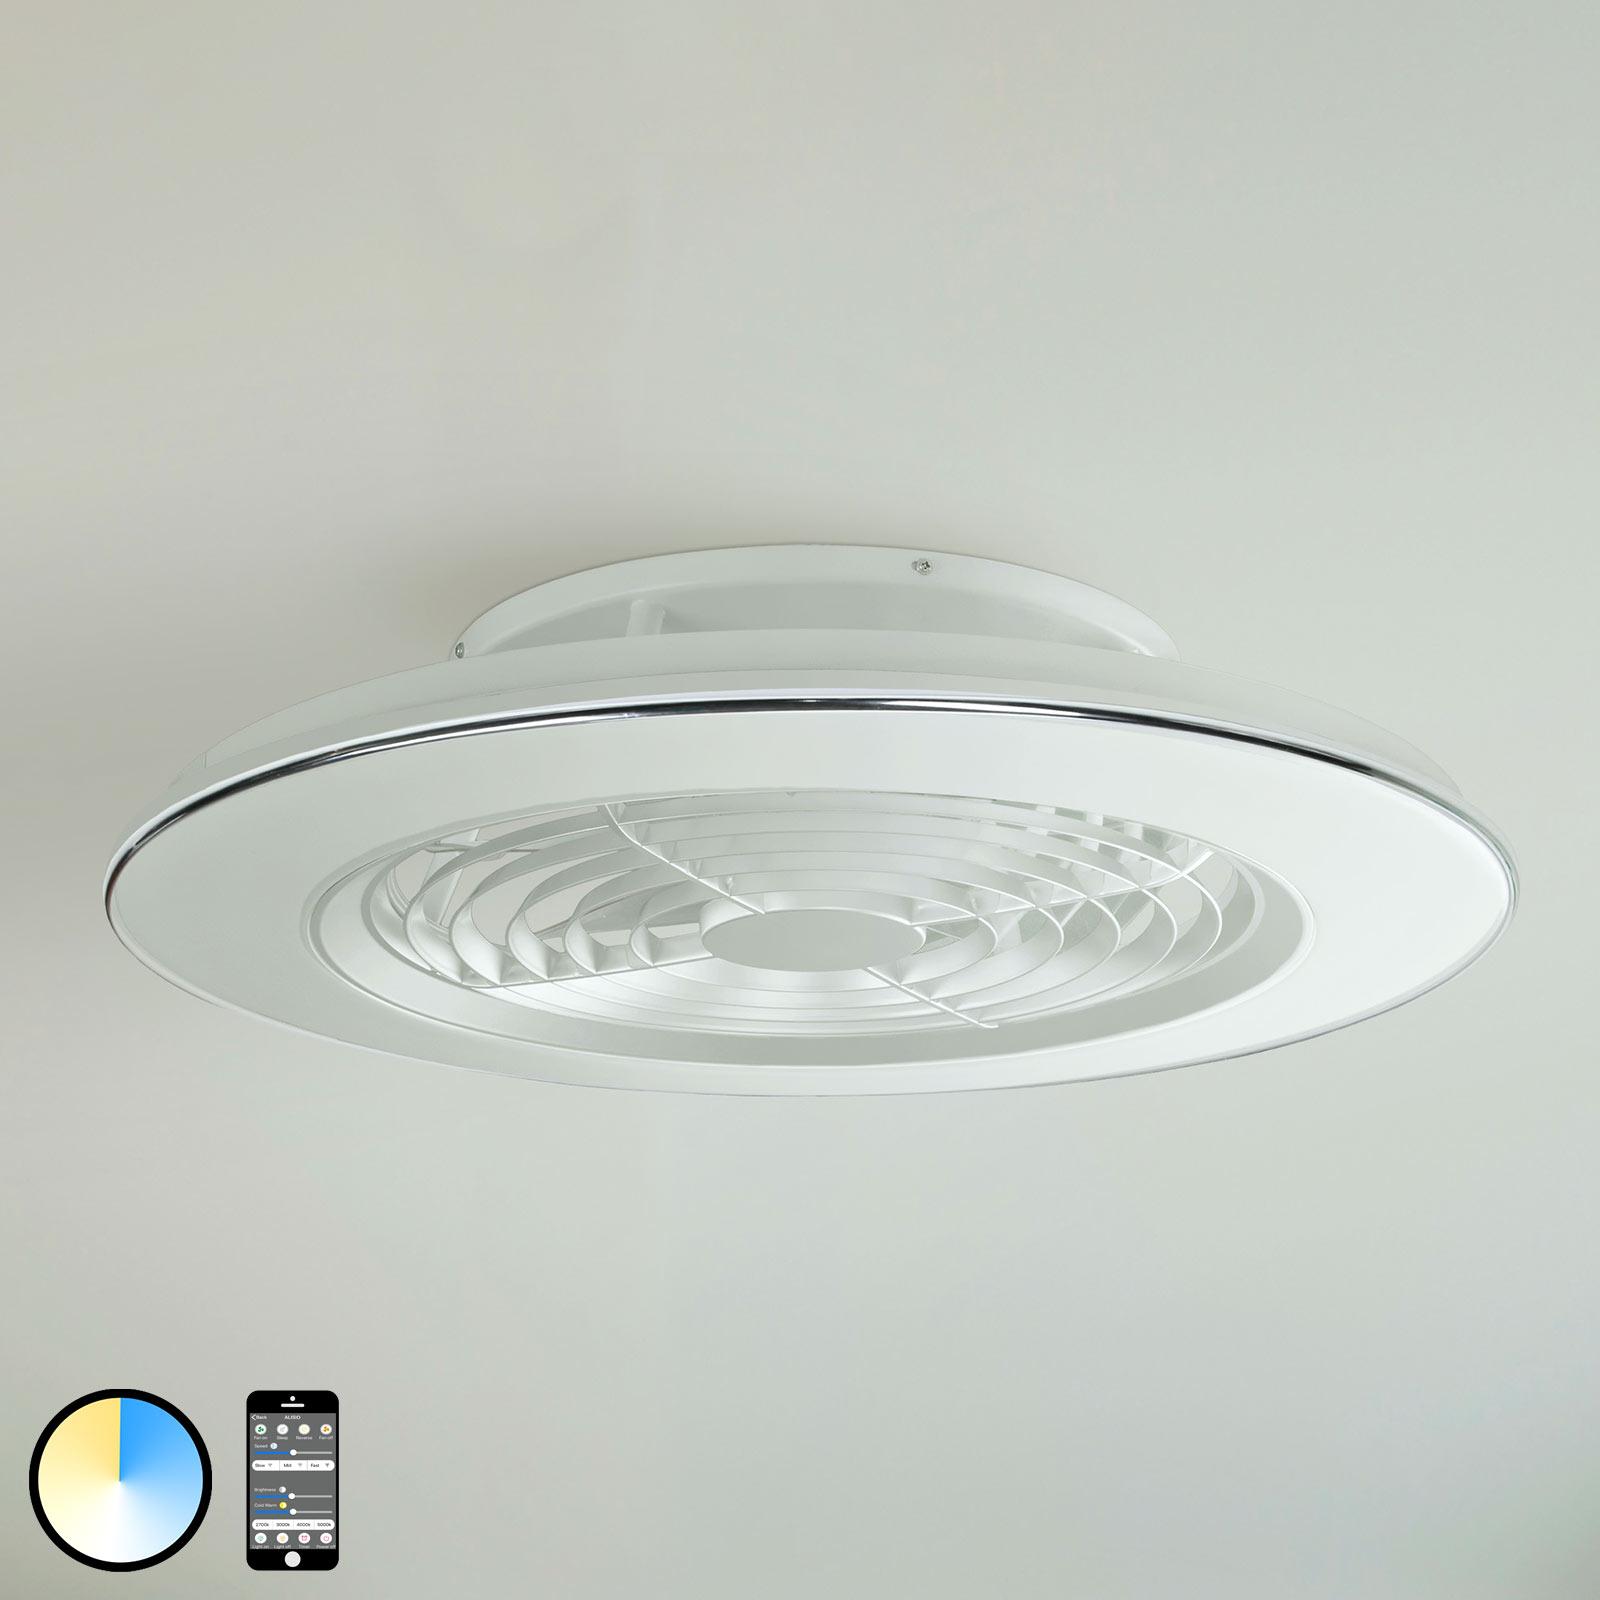 Ventilatore LED Alisio, comando app, bianco